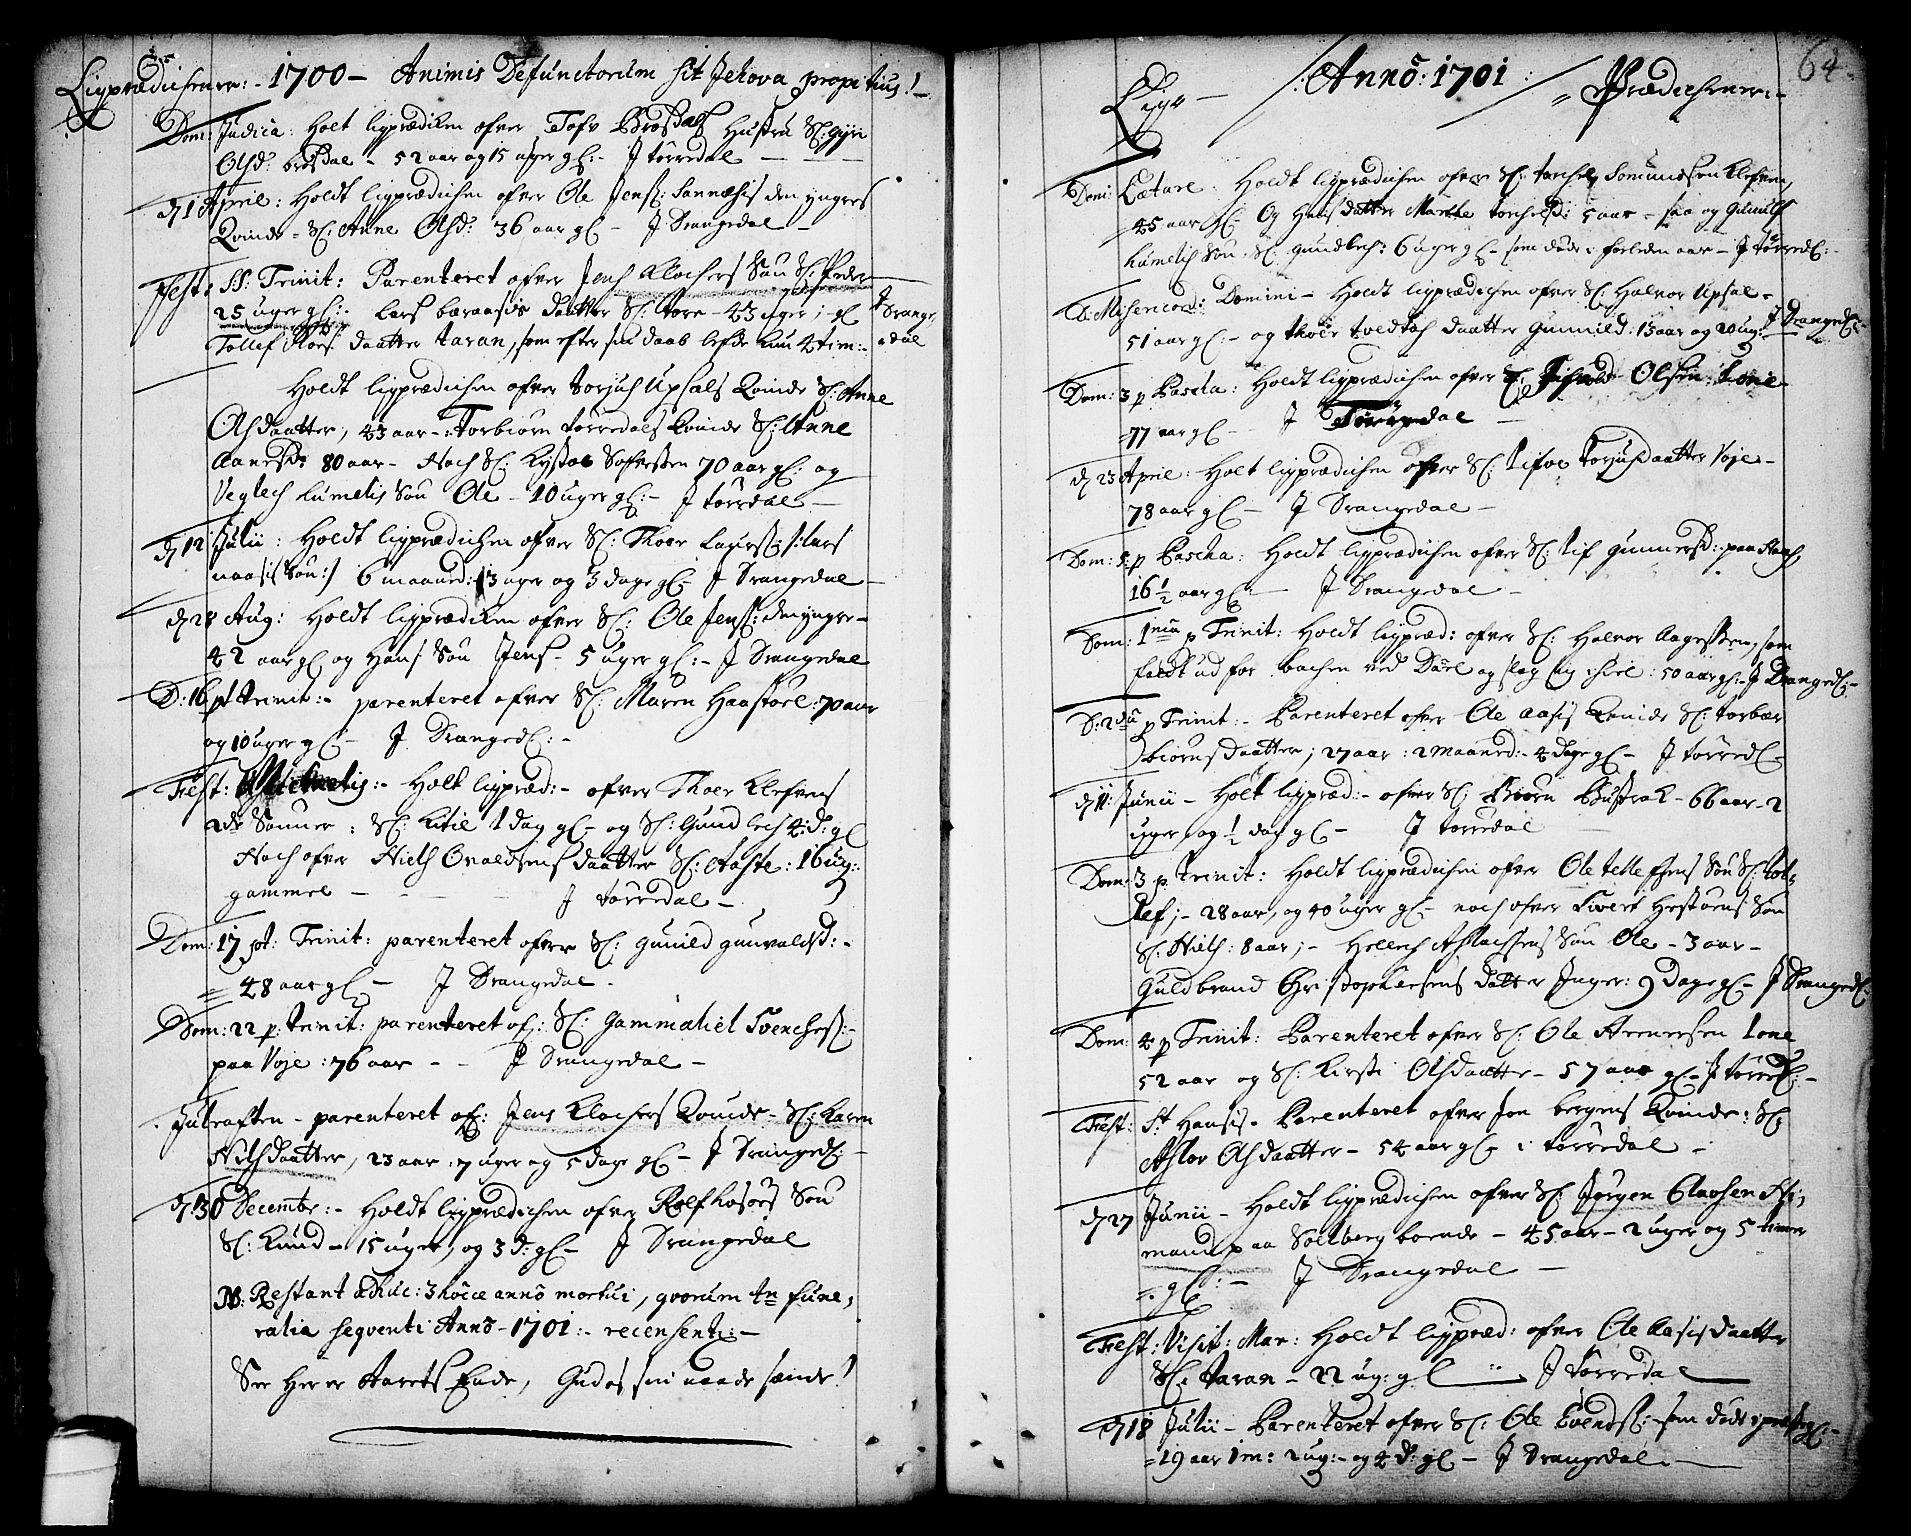 SAKO, Drangedal kirkebøker, F/Fa/L0001: Ministerialbok nr. 1, 1697-1767, s. 64